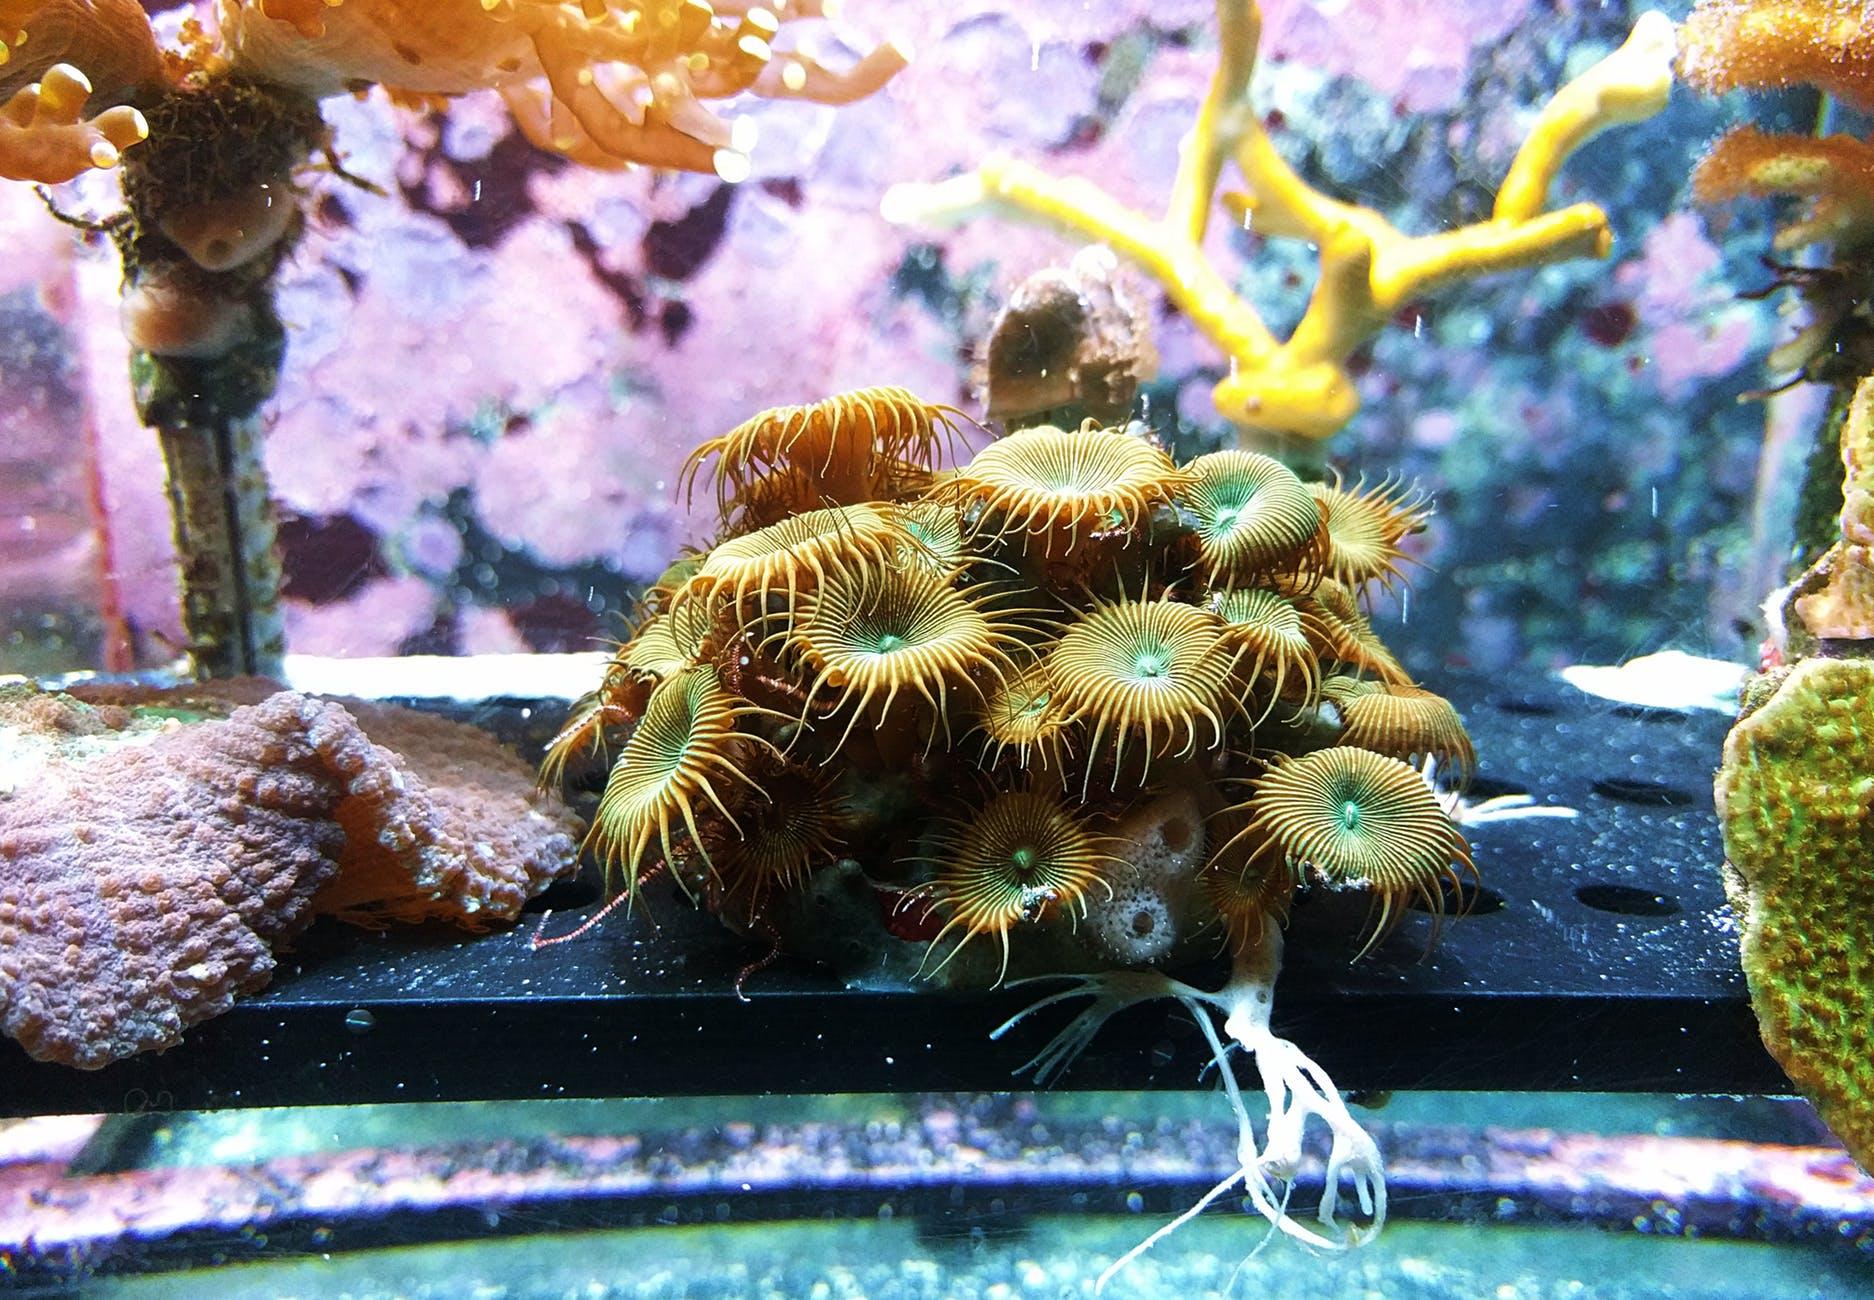 brown sea creature inside fish tank